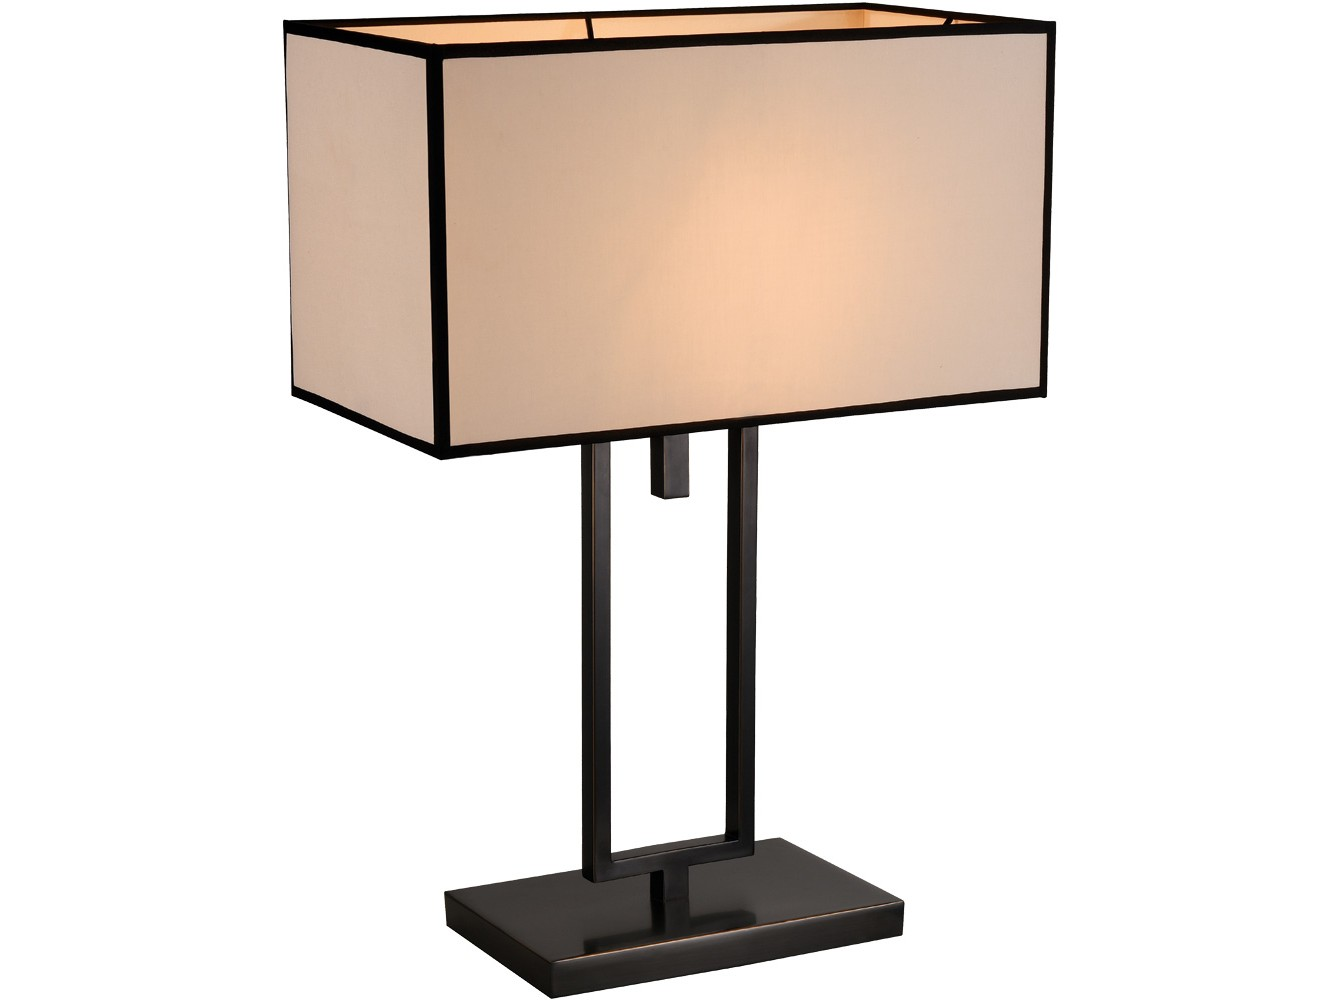 Настольная лампаДекоративные лампы<br>&amp;lt;div&amp;gt;Материалы: металл, ткань&amp;lt;/div&amp;gt;&amp;lt;div&amp;gt;Вид цоколя: Е27&amp;lt;/div&amp;gt;&amp;lt;div&amp;gt;Мощность ламп: 40W&amp;lt;/div&amp;gt;&amp;lt;div&amp;gt;Количество ламп: 1&amp;lt;/div&amp;gt;&amp;lt;div&amp;gt;Наличие ламп: нет&amp;lt;/div&amp;gt;<br><br>Material: Металл<br>Ширина см: 45<br>Высота см: 63<br>Глубина см: 24